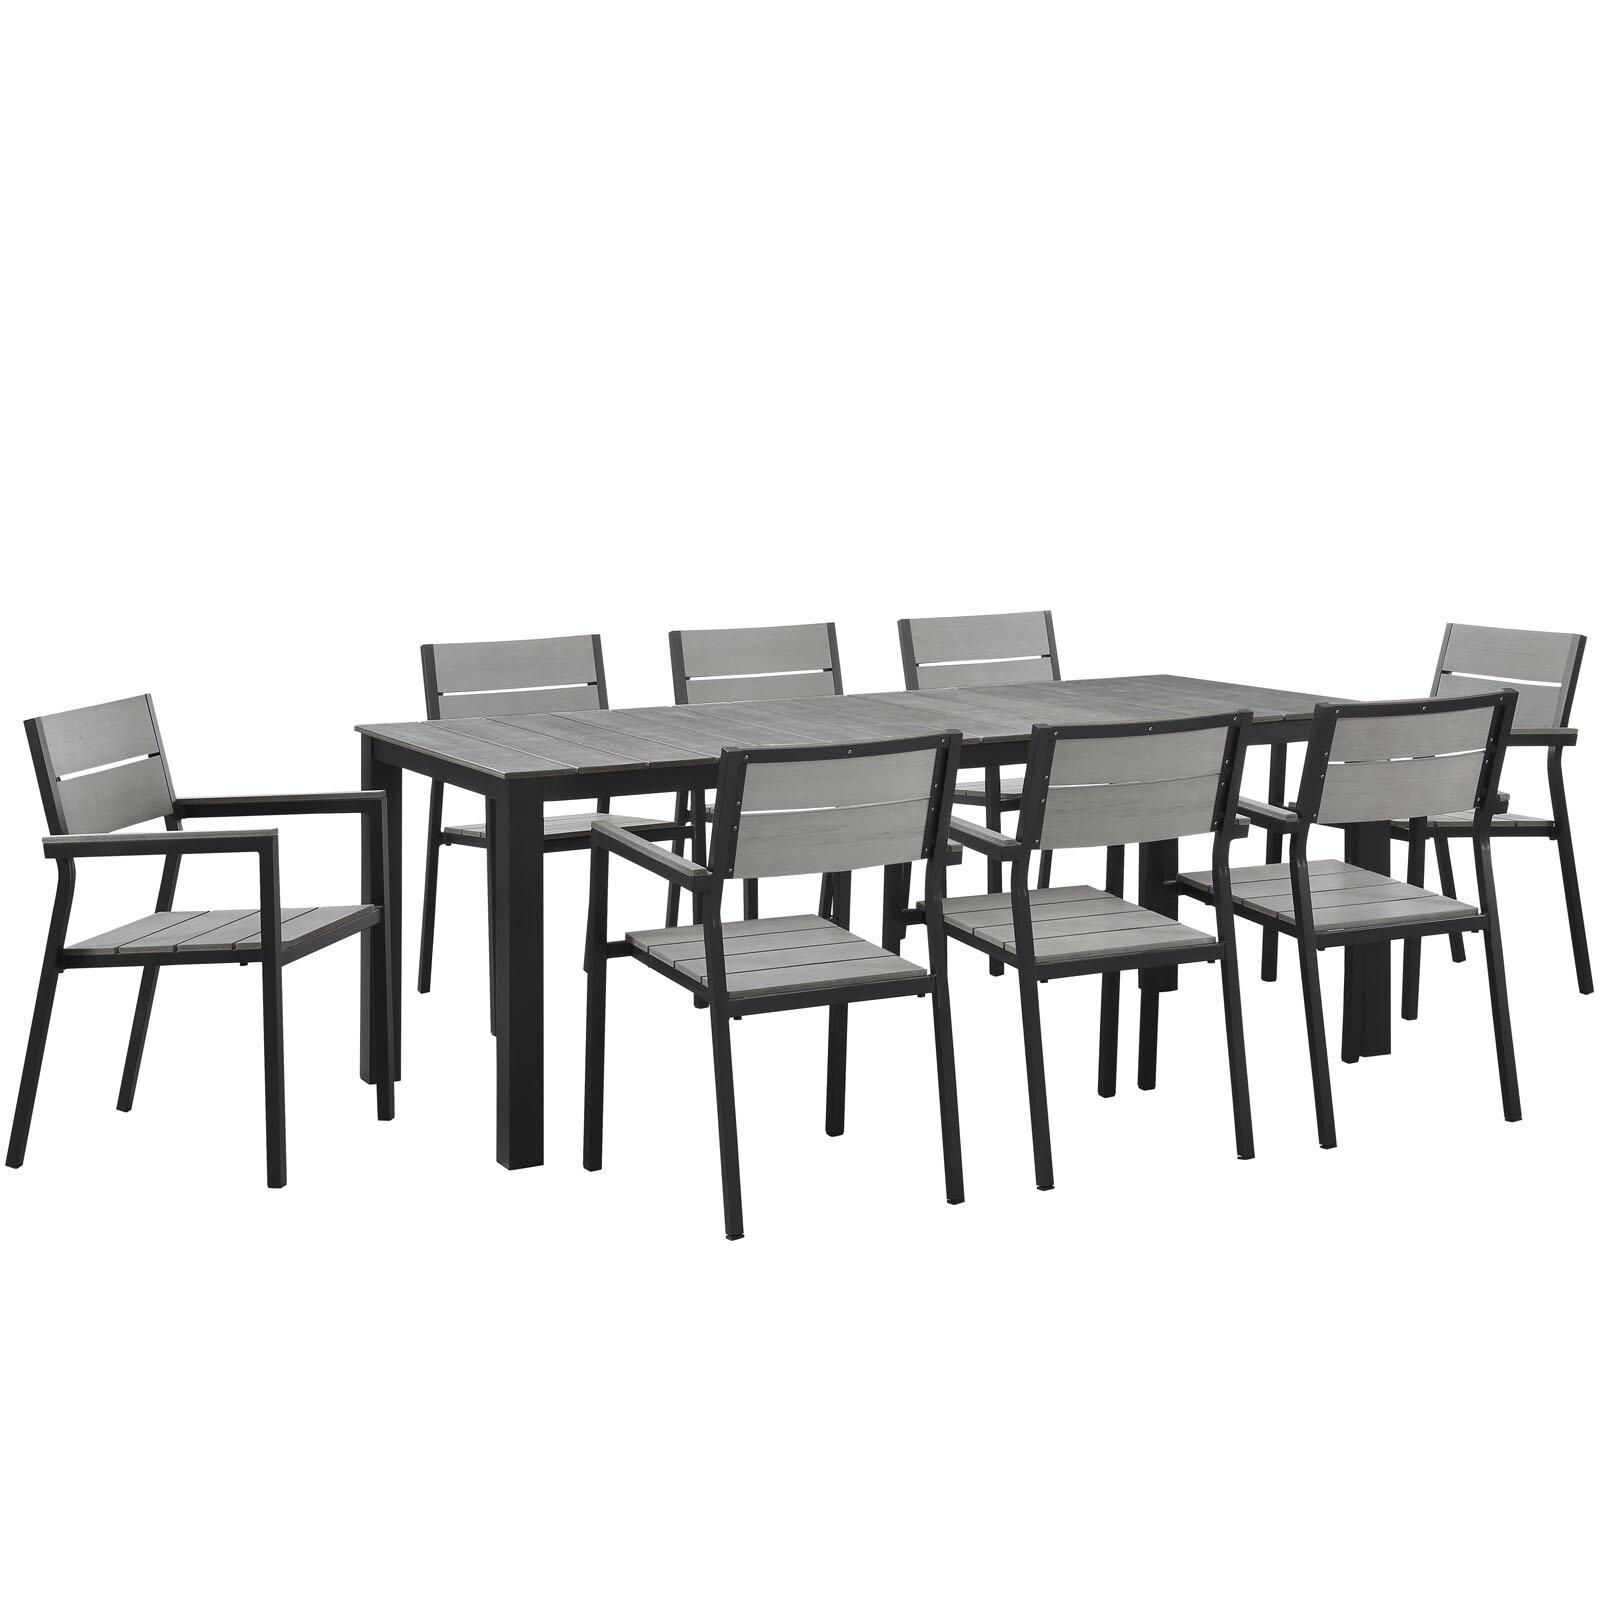 Modway maine 9 piece outdoor patio dining set wayfair for Outdoor furniture 9 piece